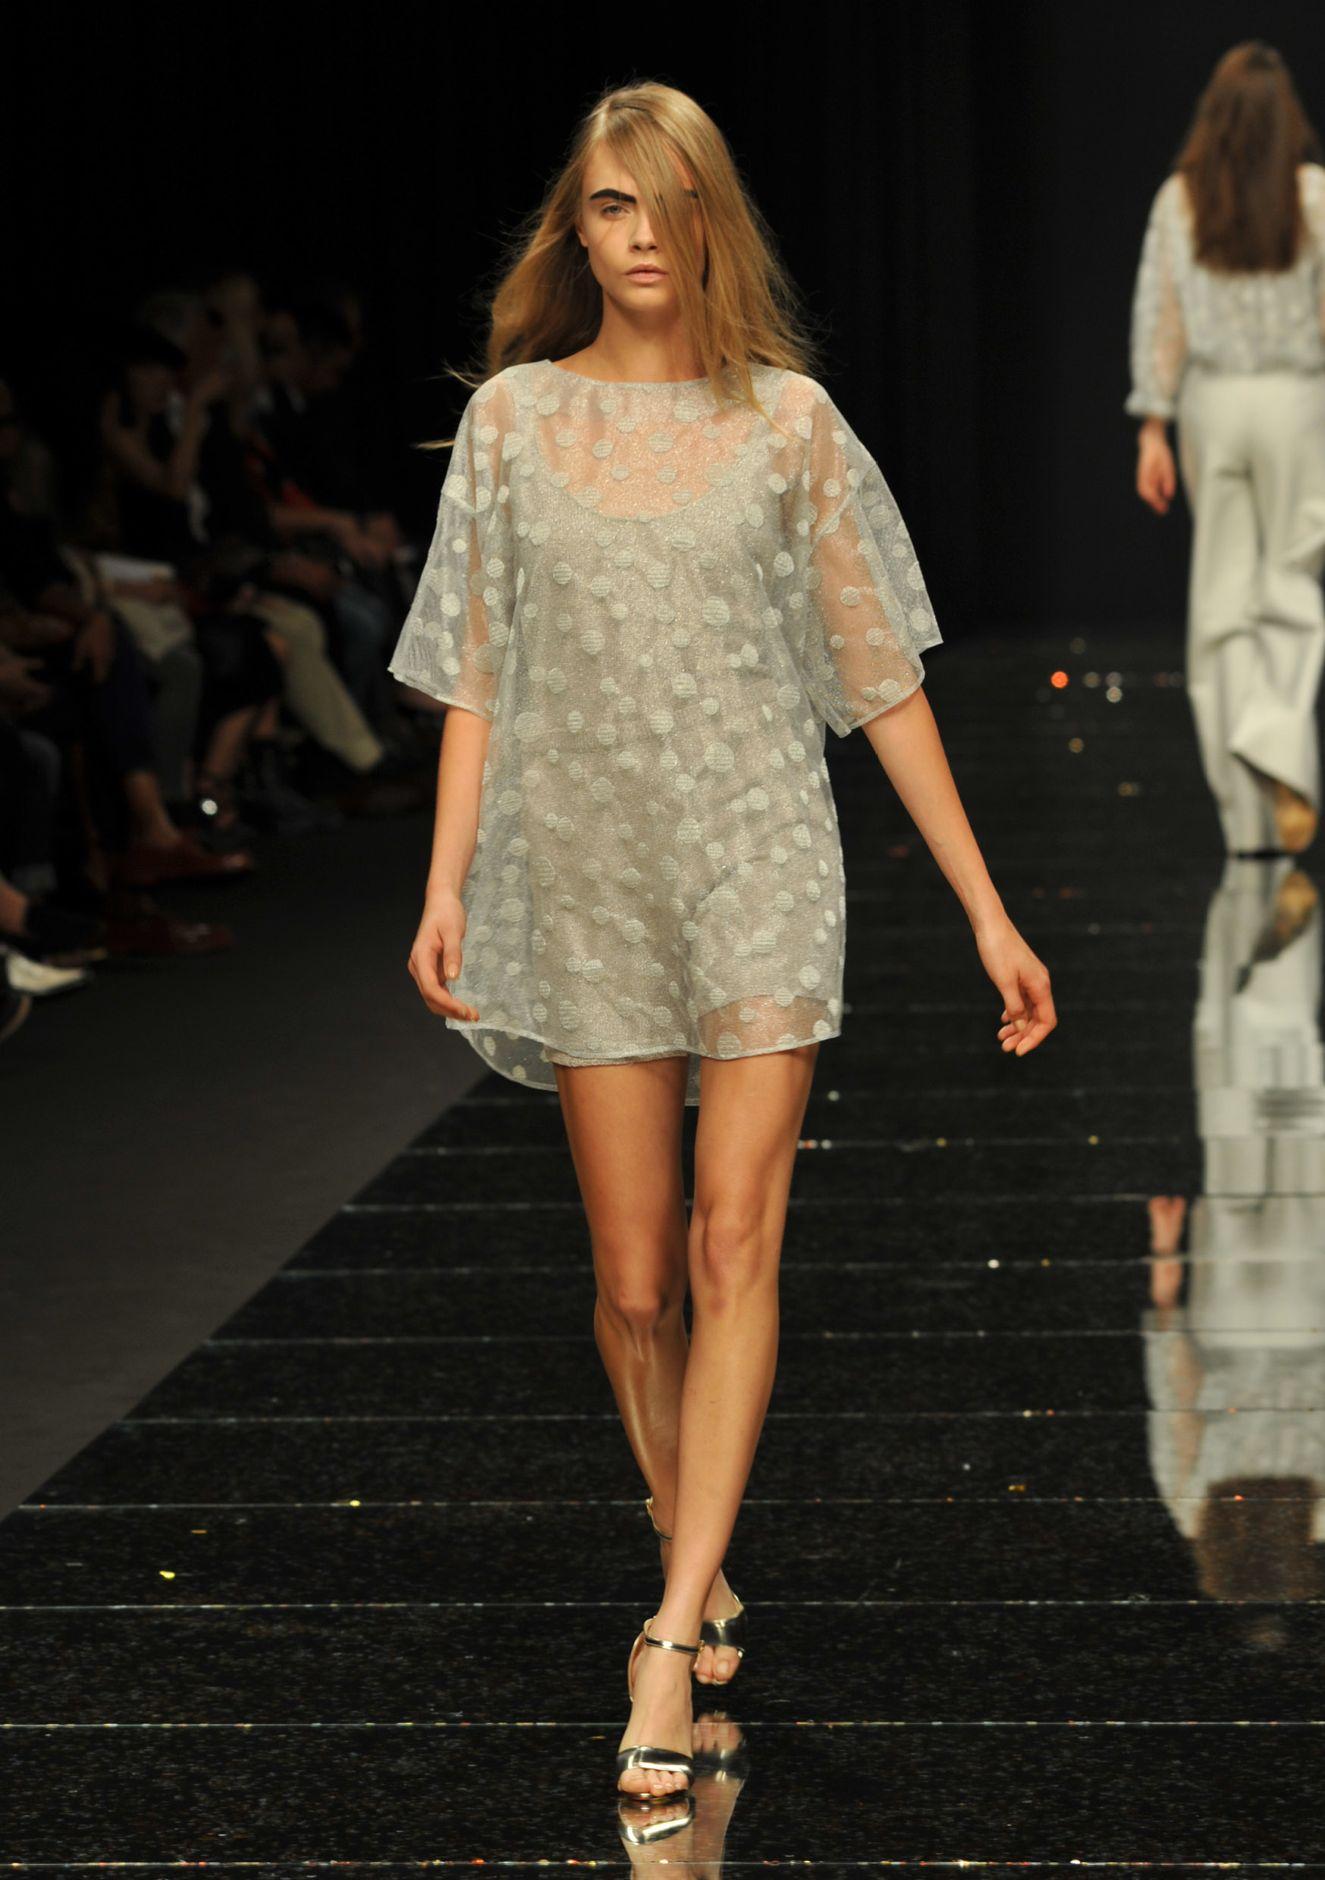 Catwalk Anteprima Spring Summer 2013 Women Collection Milano Fashion Week